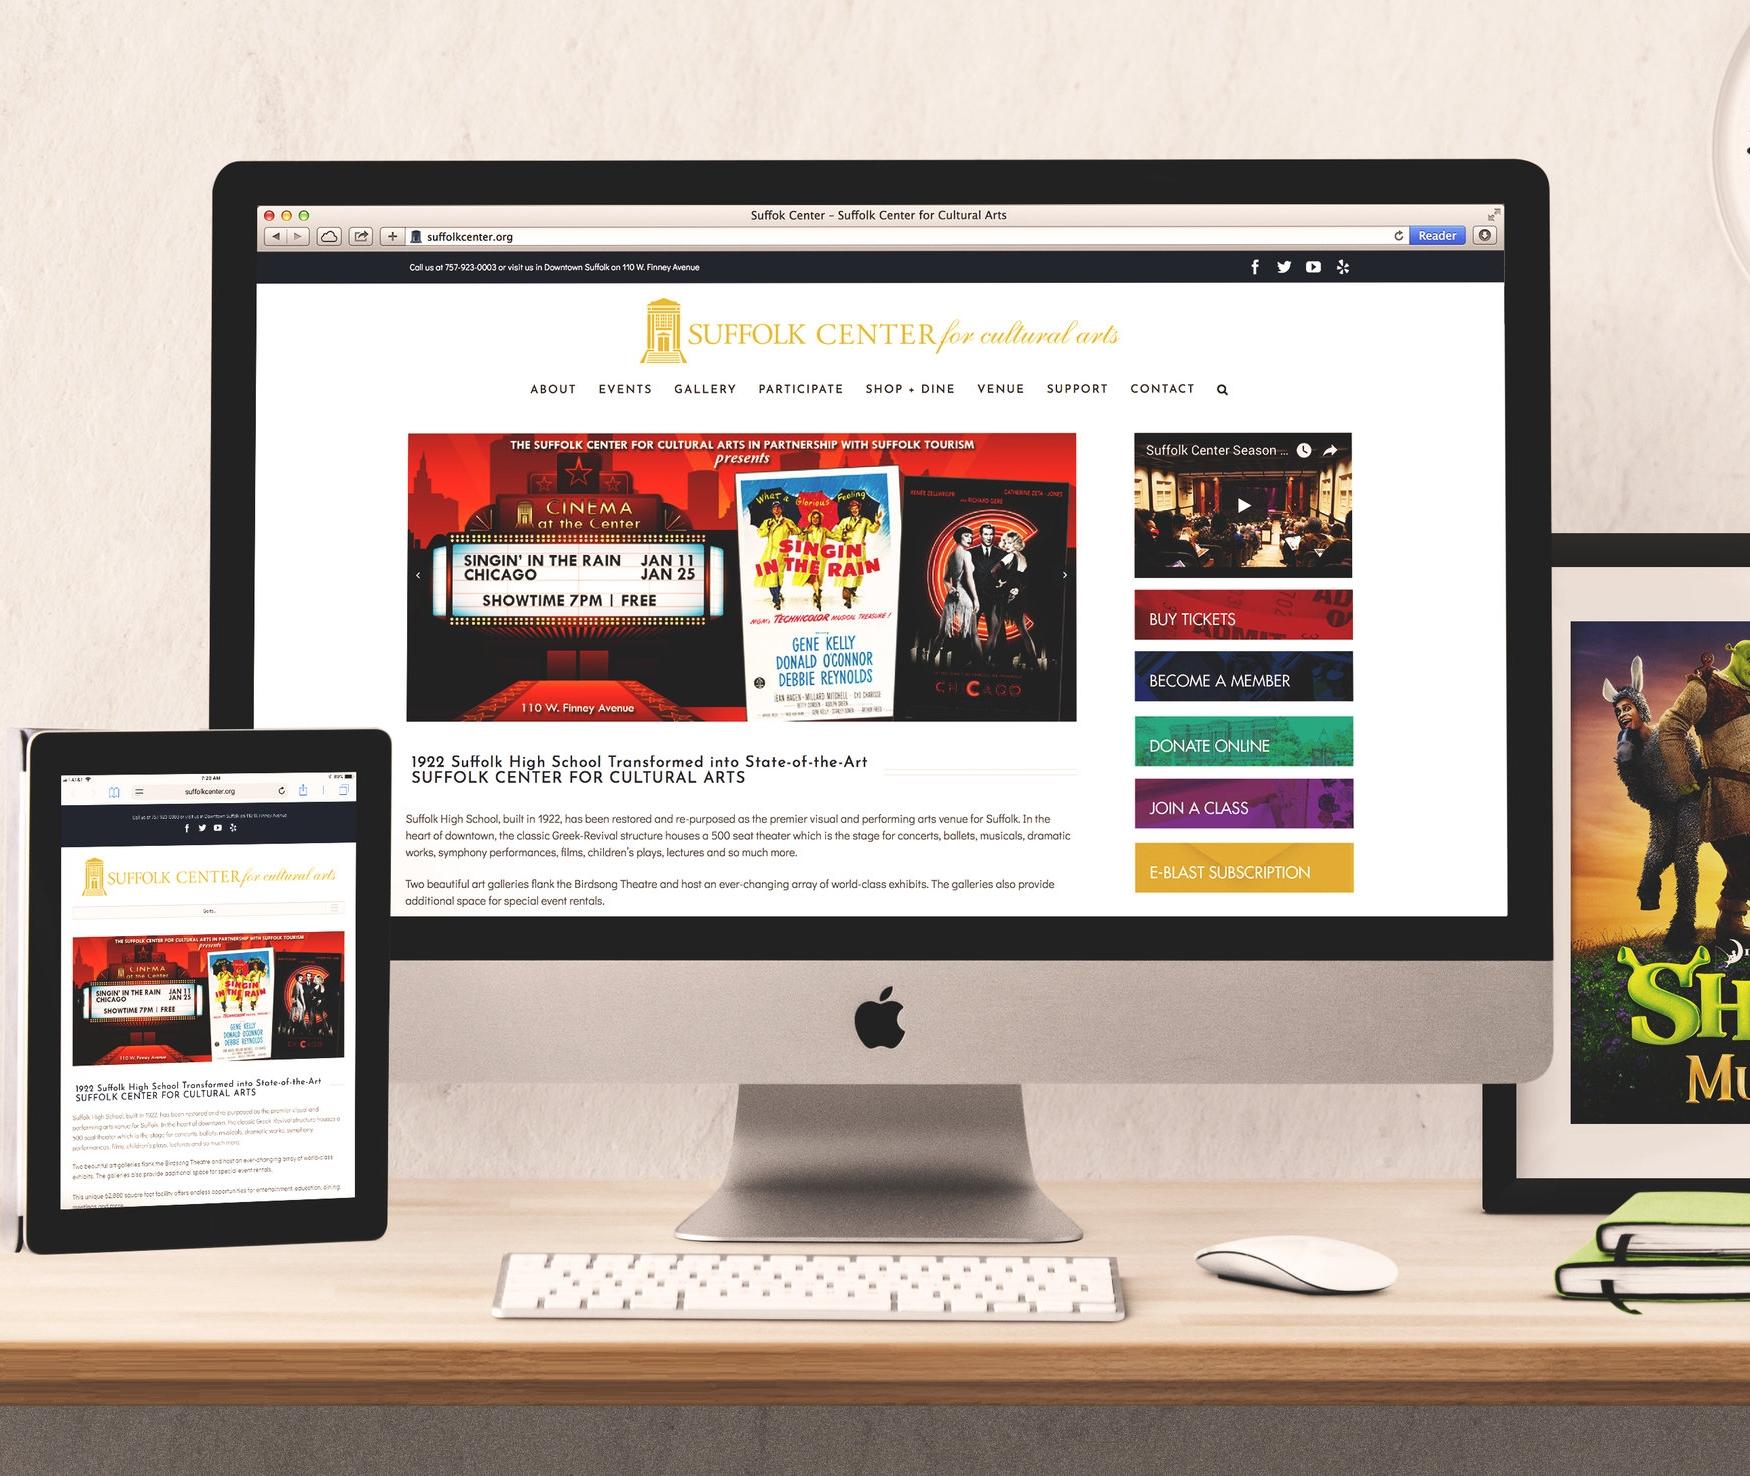 Suffolk-Center-for-Cultural-Arts_Website-Design_KWD-Advertising.jpg